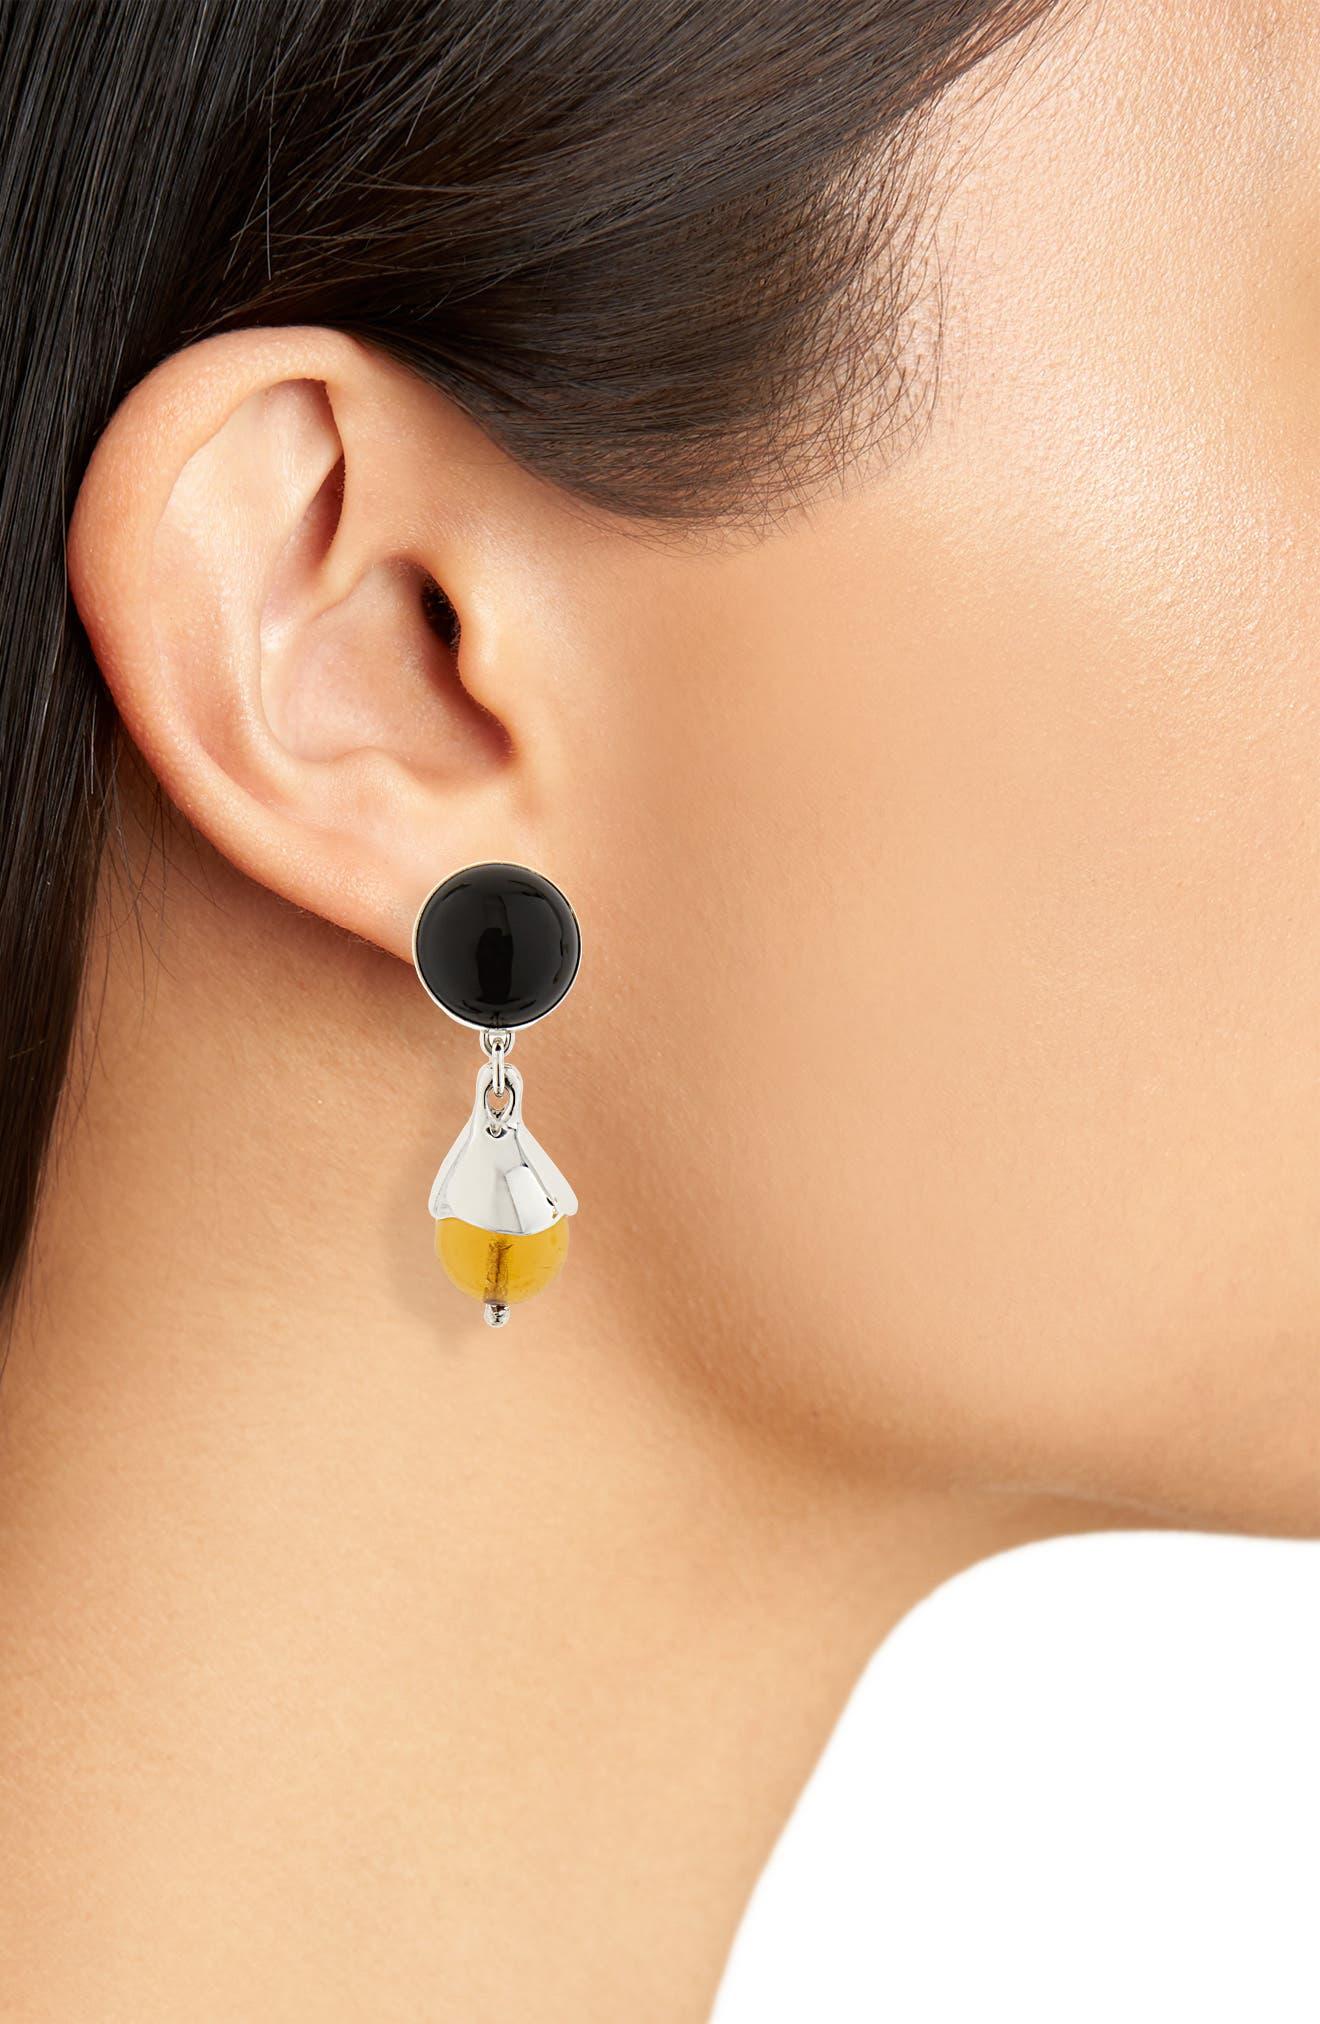 Chapeau Drop Earrings,                             Alternate thumbnail 2, color,                             STERLING SILVER